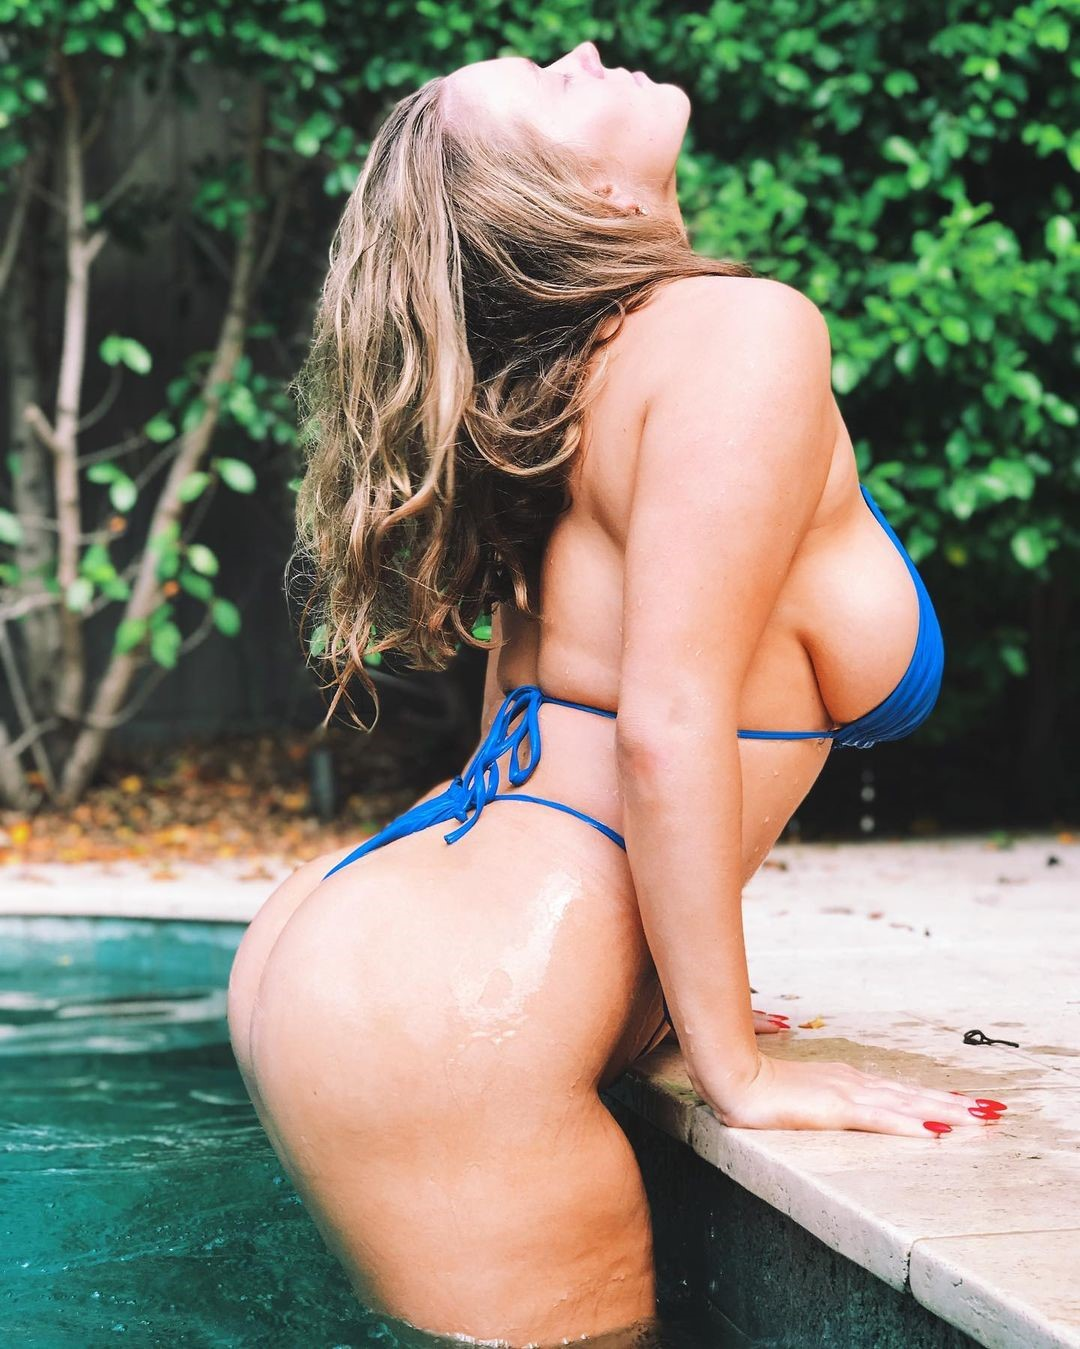 Avalon Hope Blue Bikini